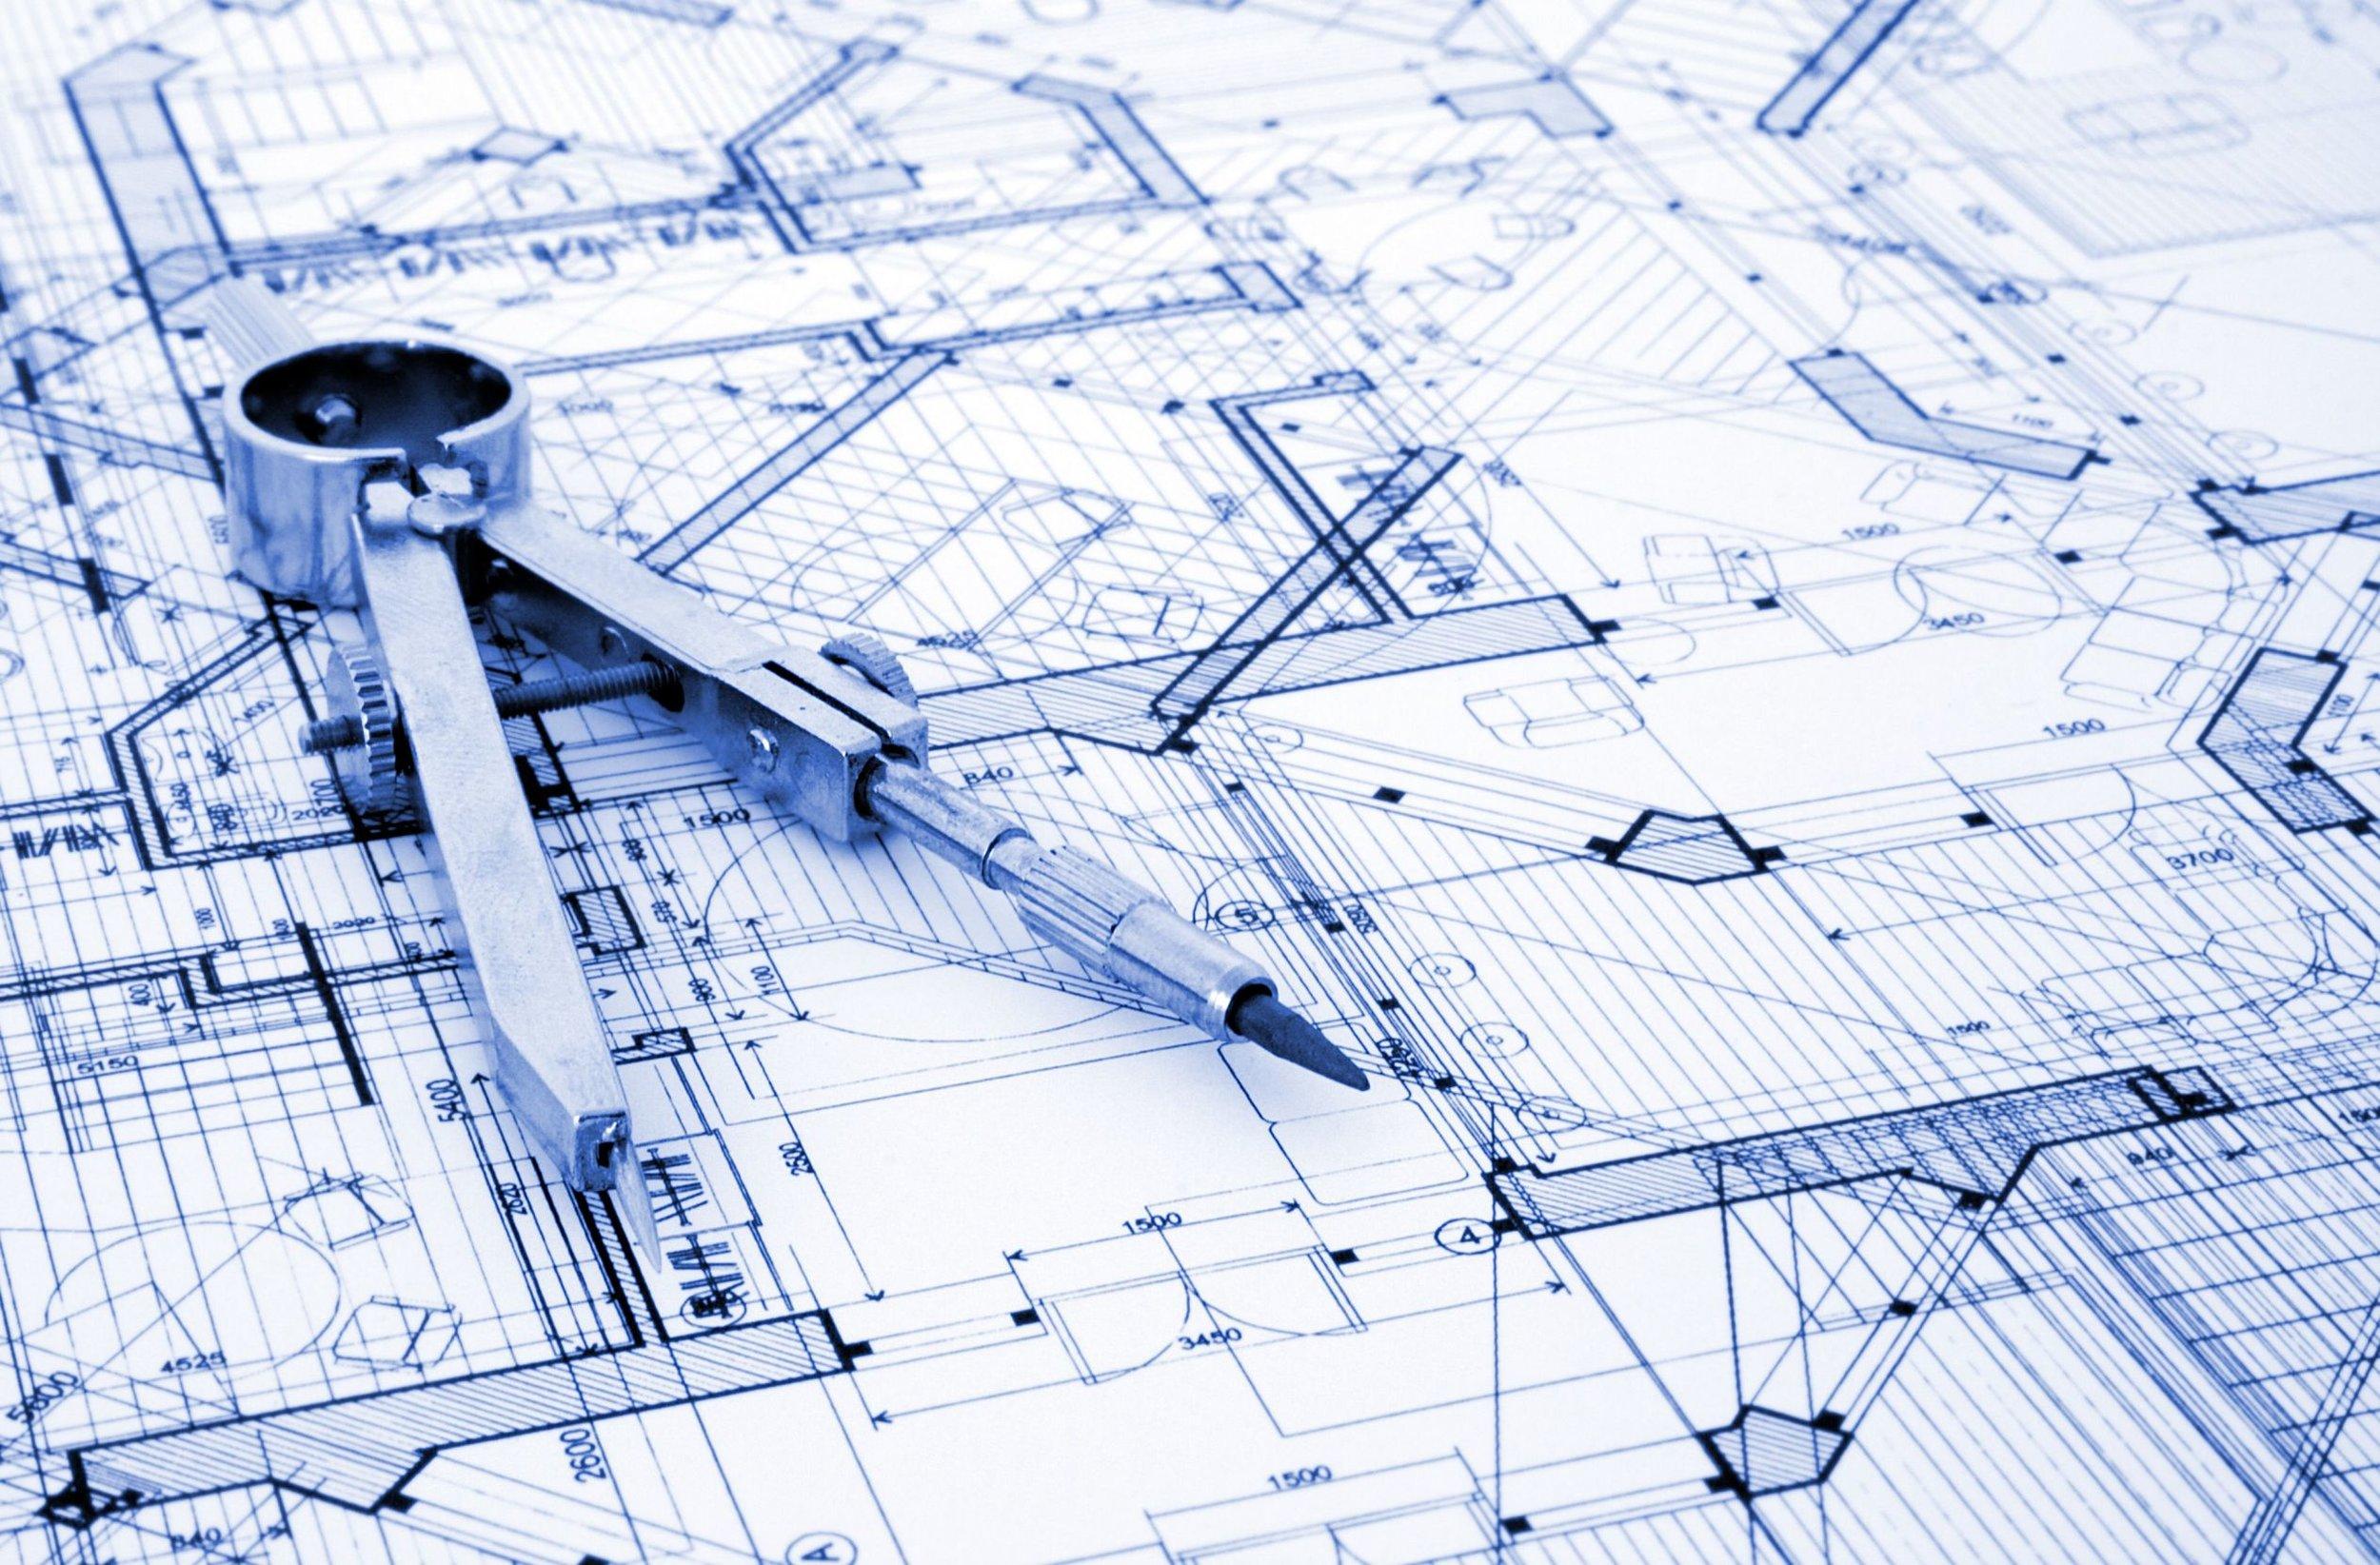 Frontier Valve custom valve engineering and design